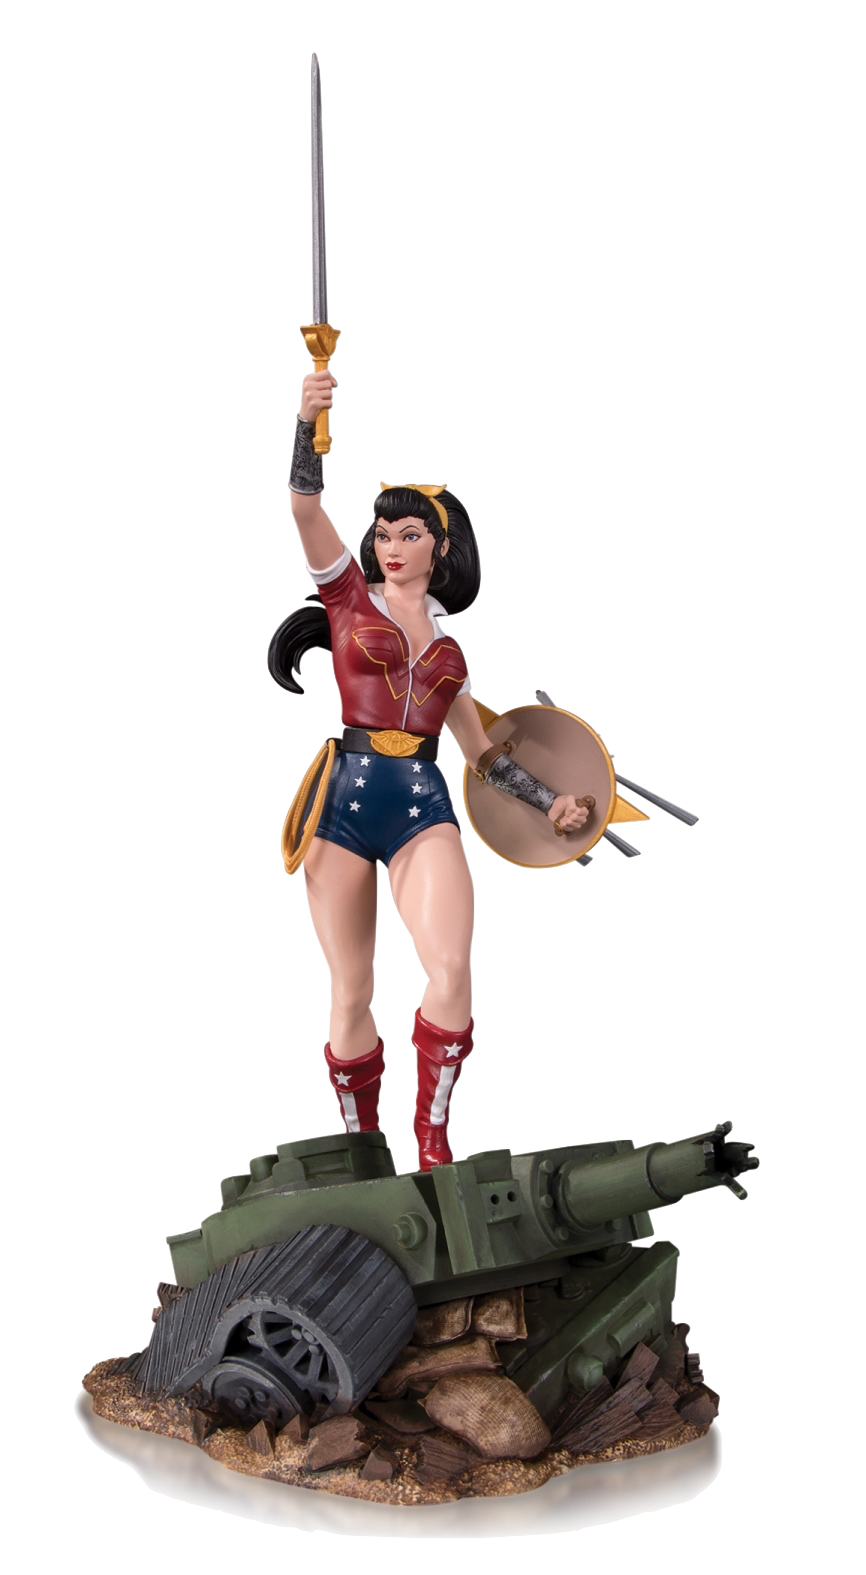 dc-bombshells-wonder-woman-deluxe-statue-toyslife